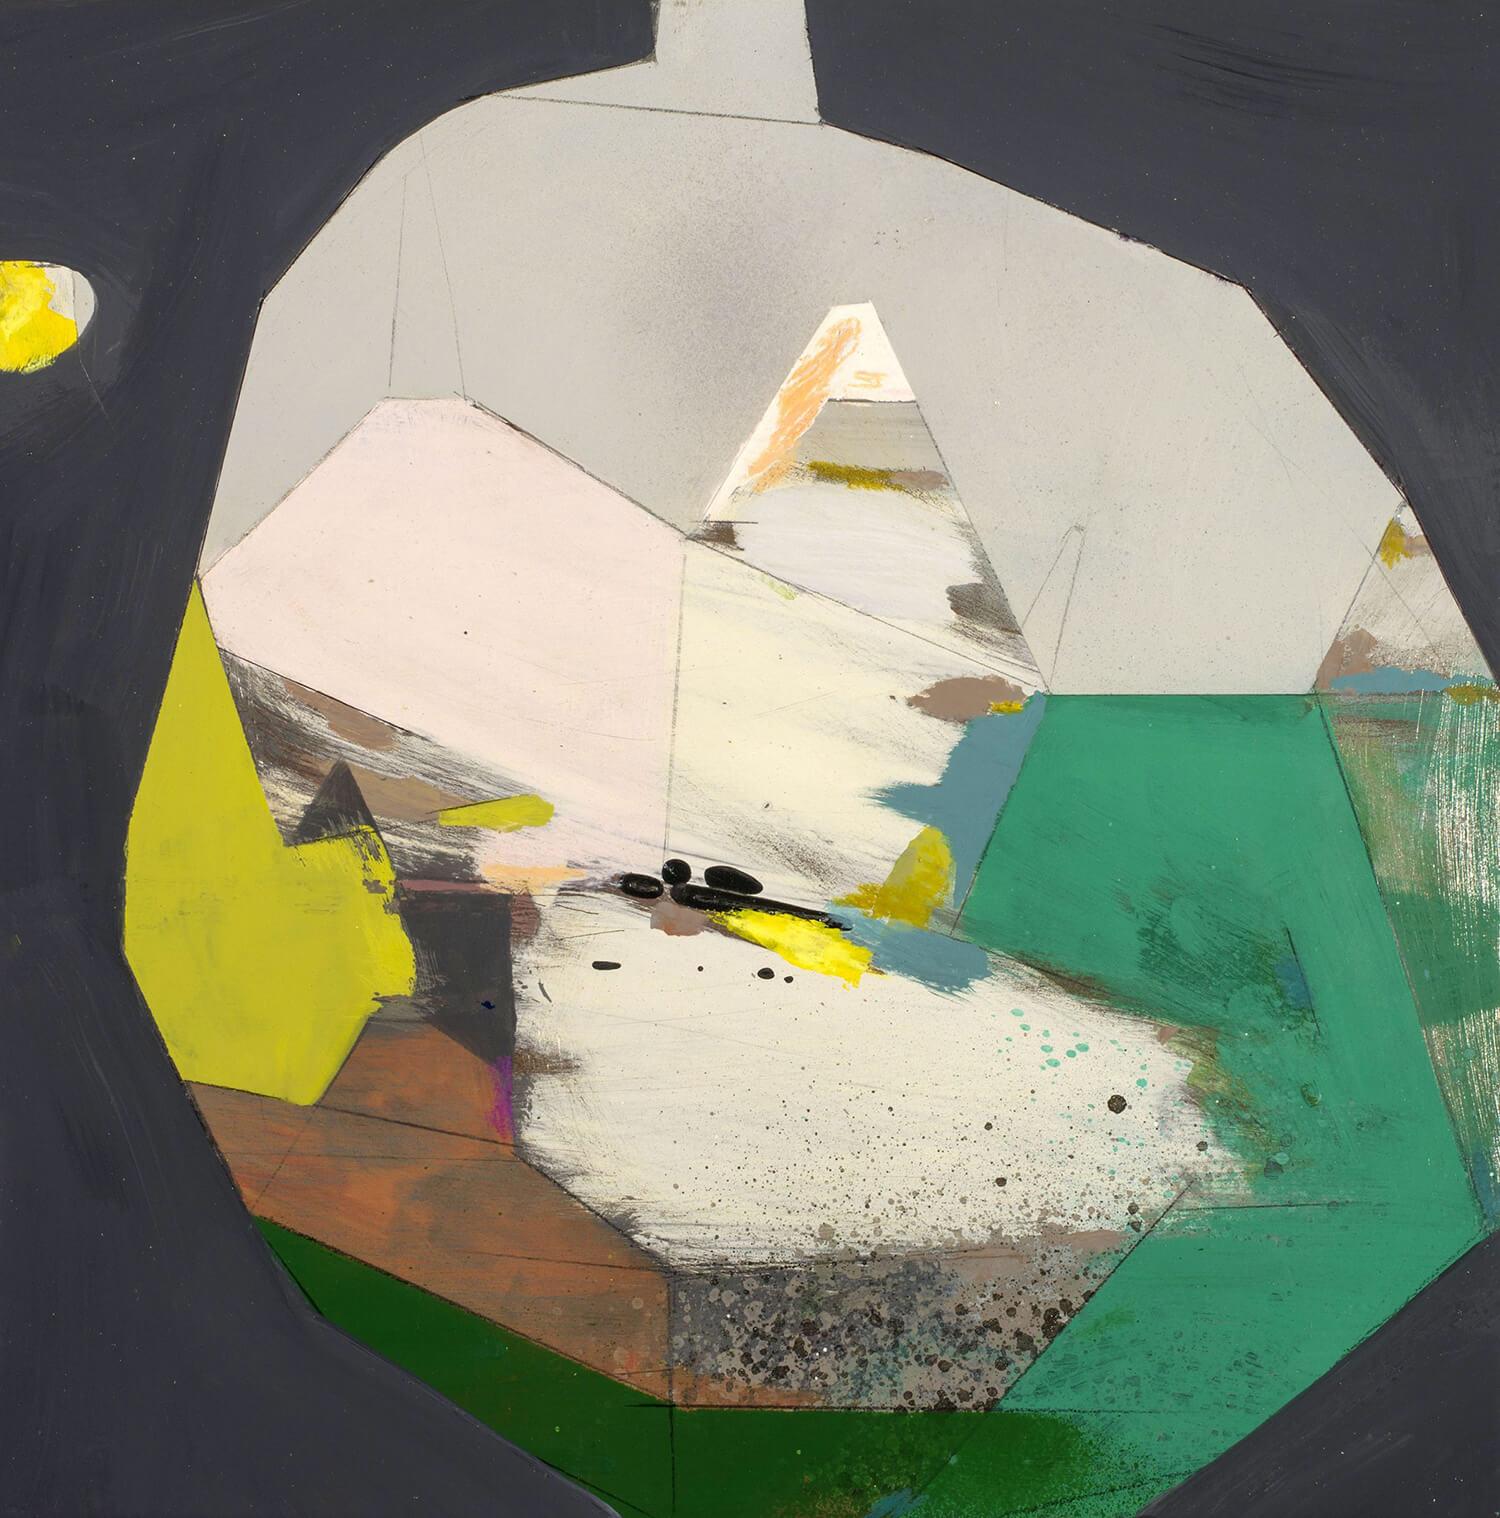 'Vander Range' by Ari Athens | Edwina Corlette Gallery